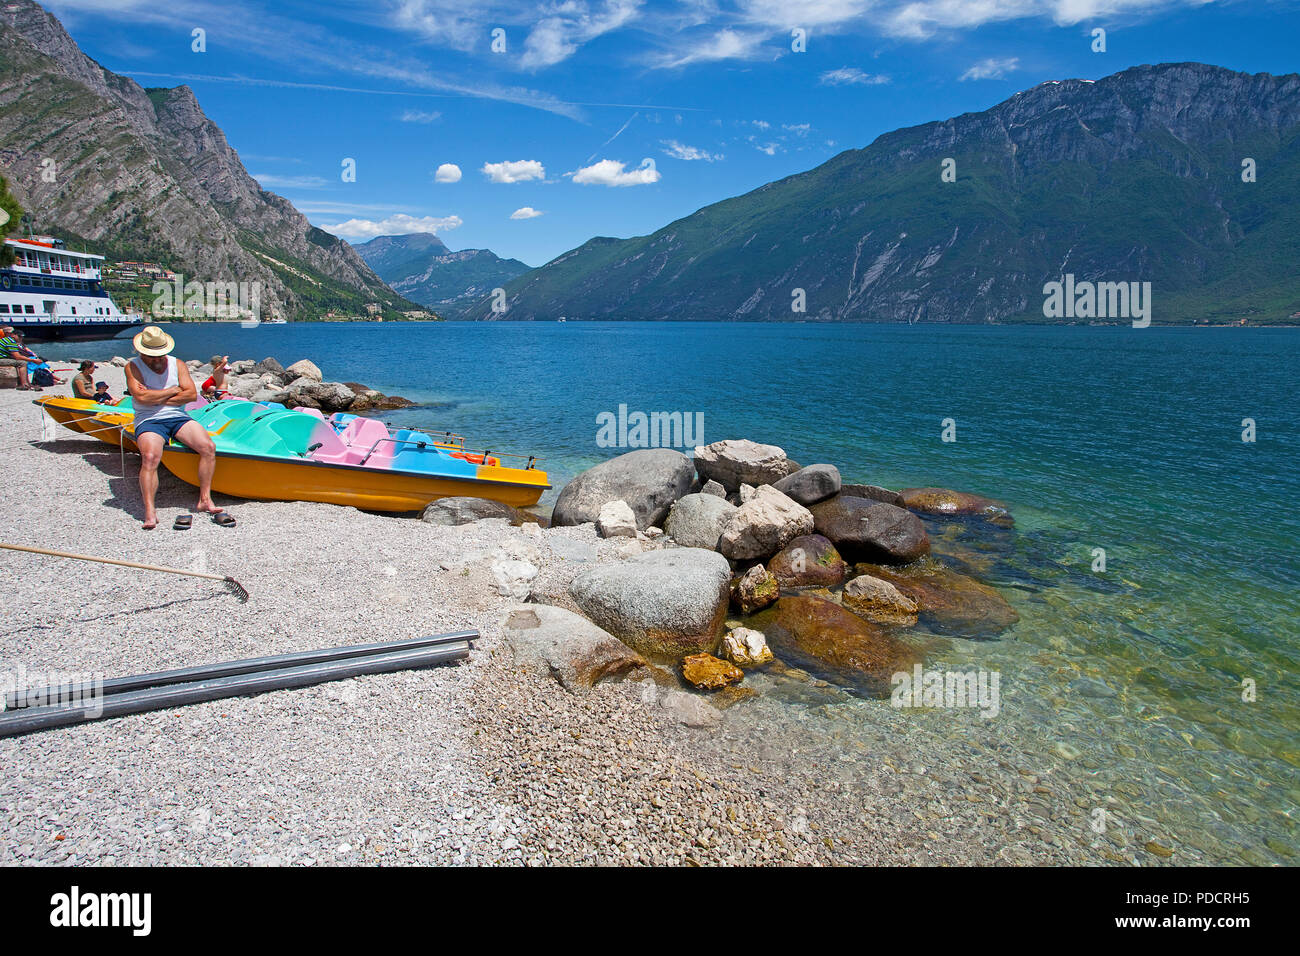 People at the beach of Limone, Limone sul Garda, Garda lake, Lombardy, Italy Stock Photo